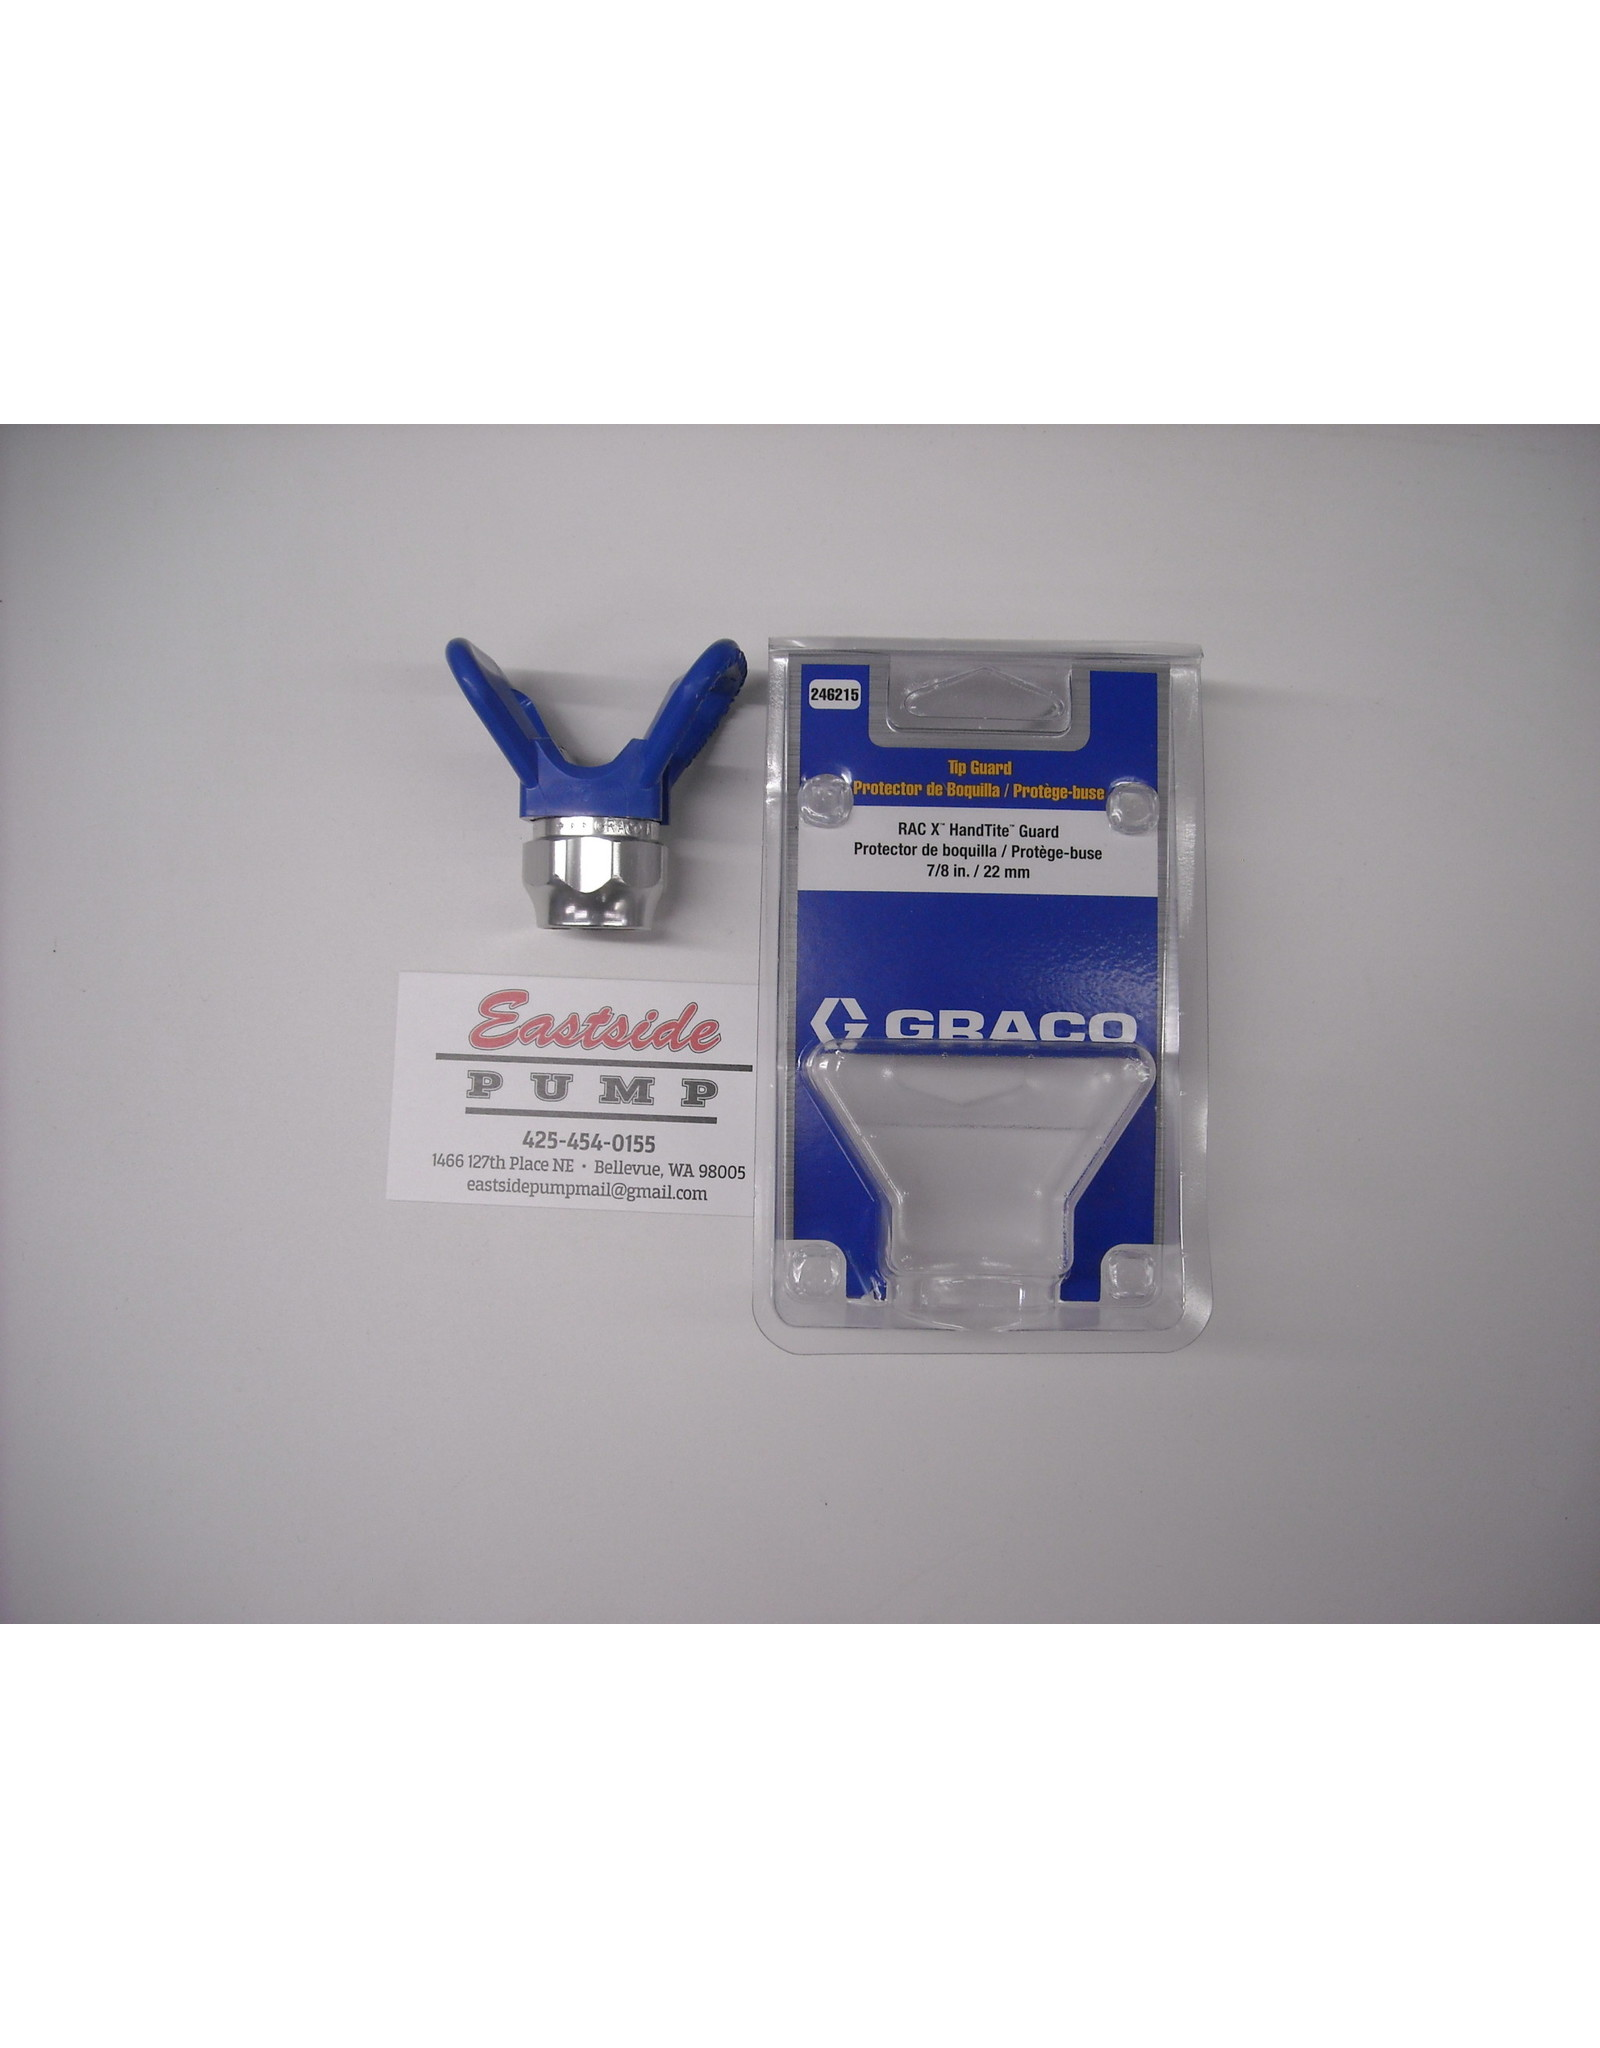 Graco 246215 RAC X Tip Guard